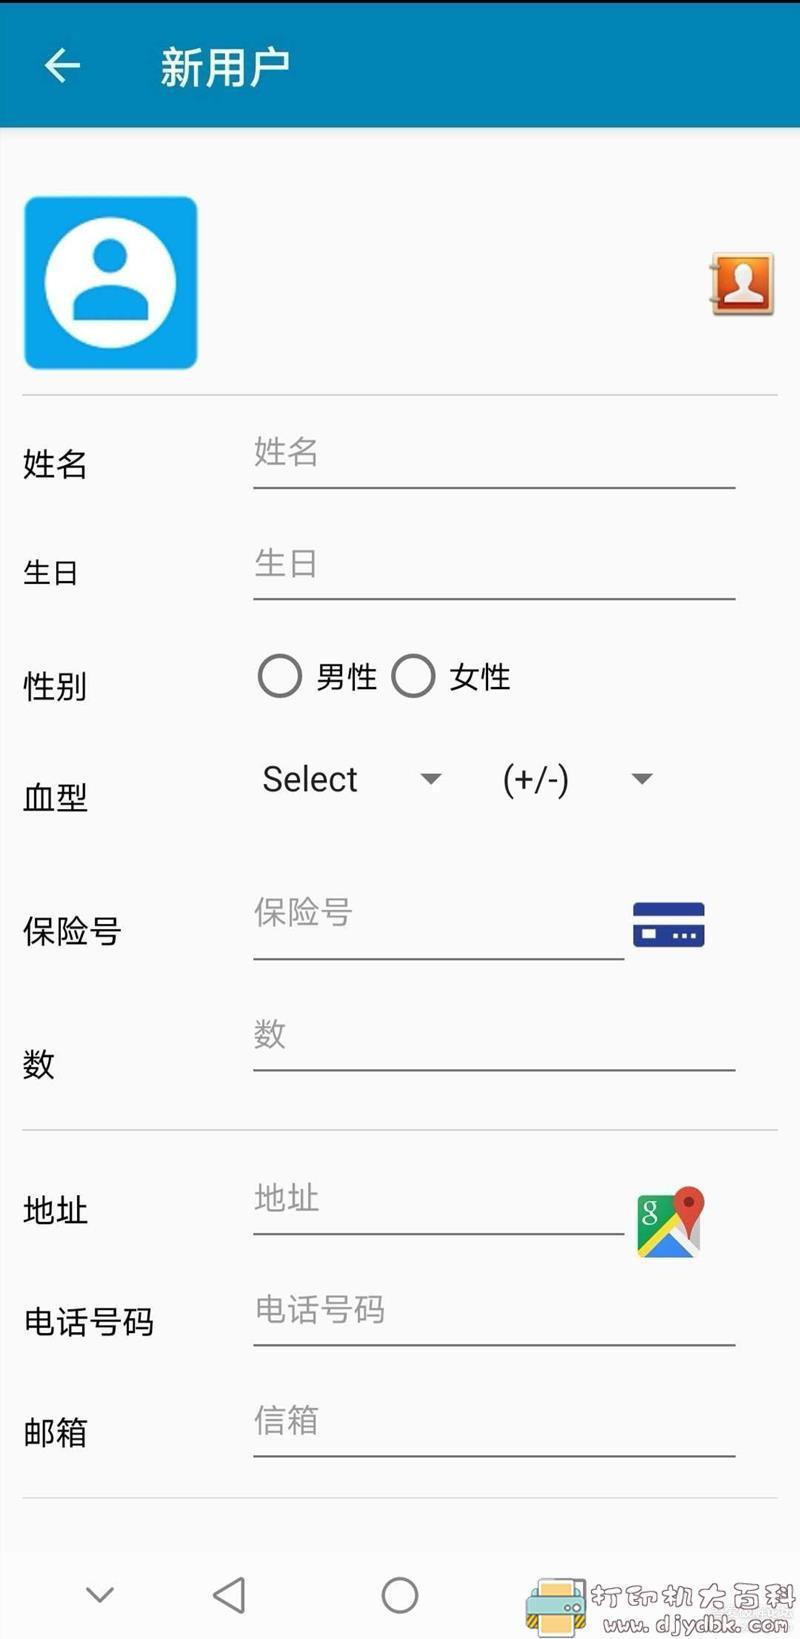 [Android]【医疗记录app】便携记录者患者医疗情况图片 No.2